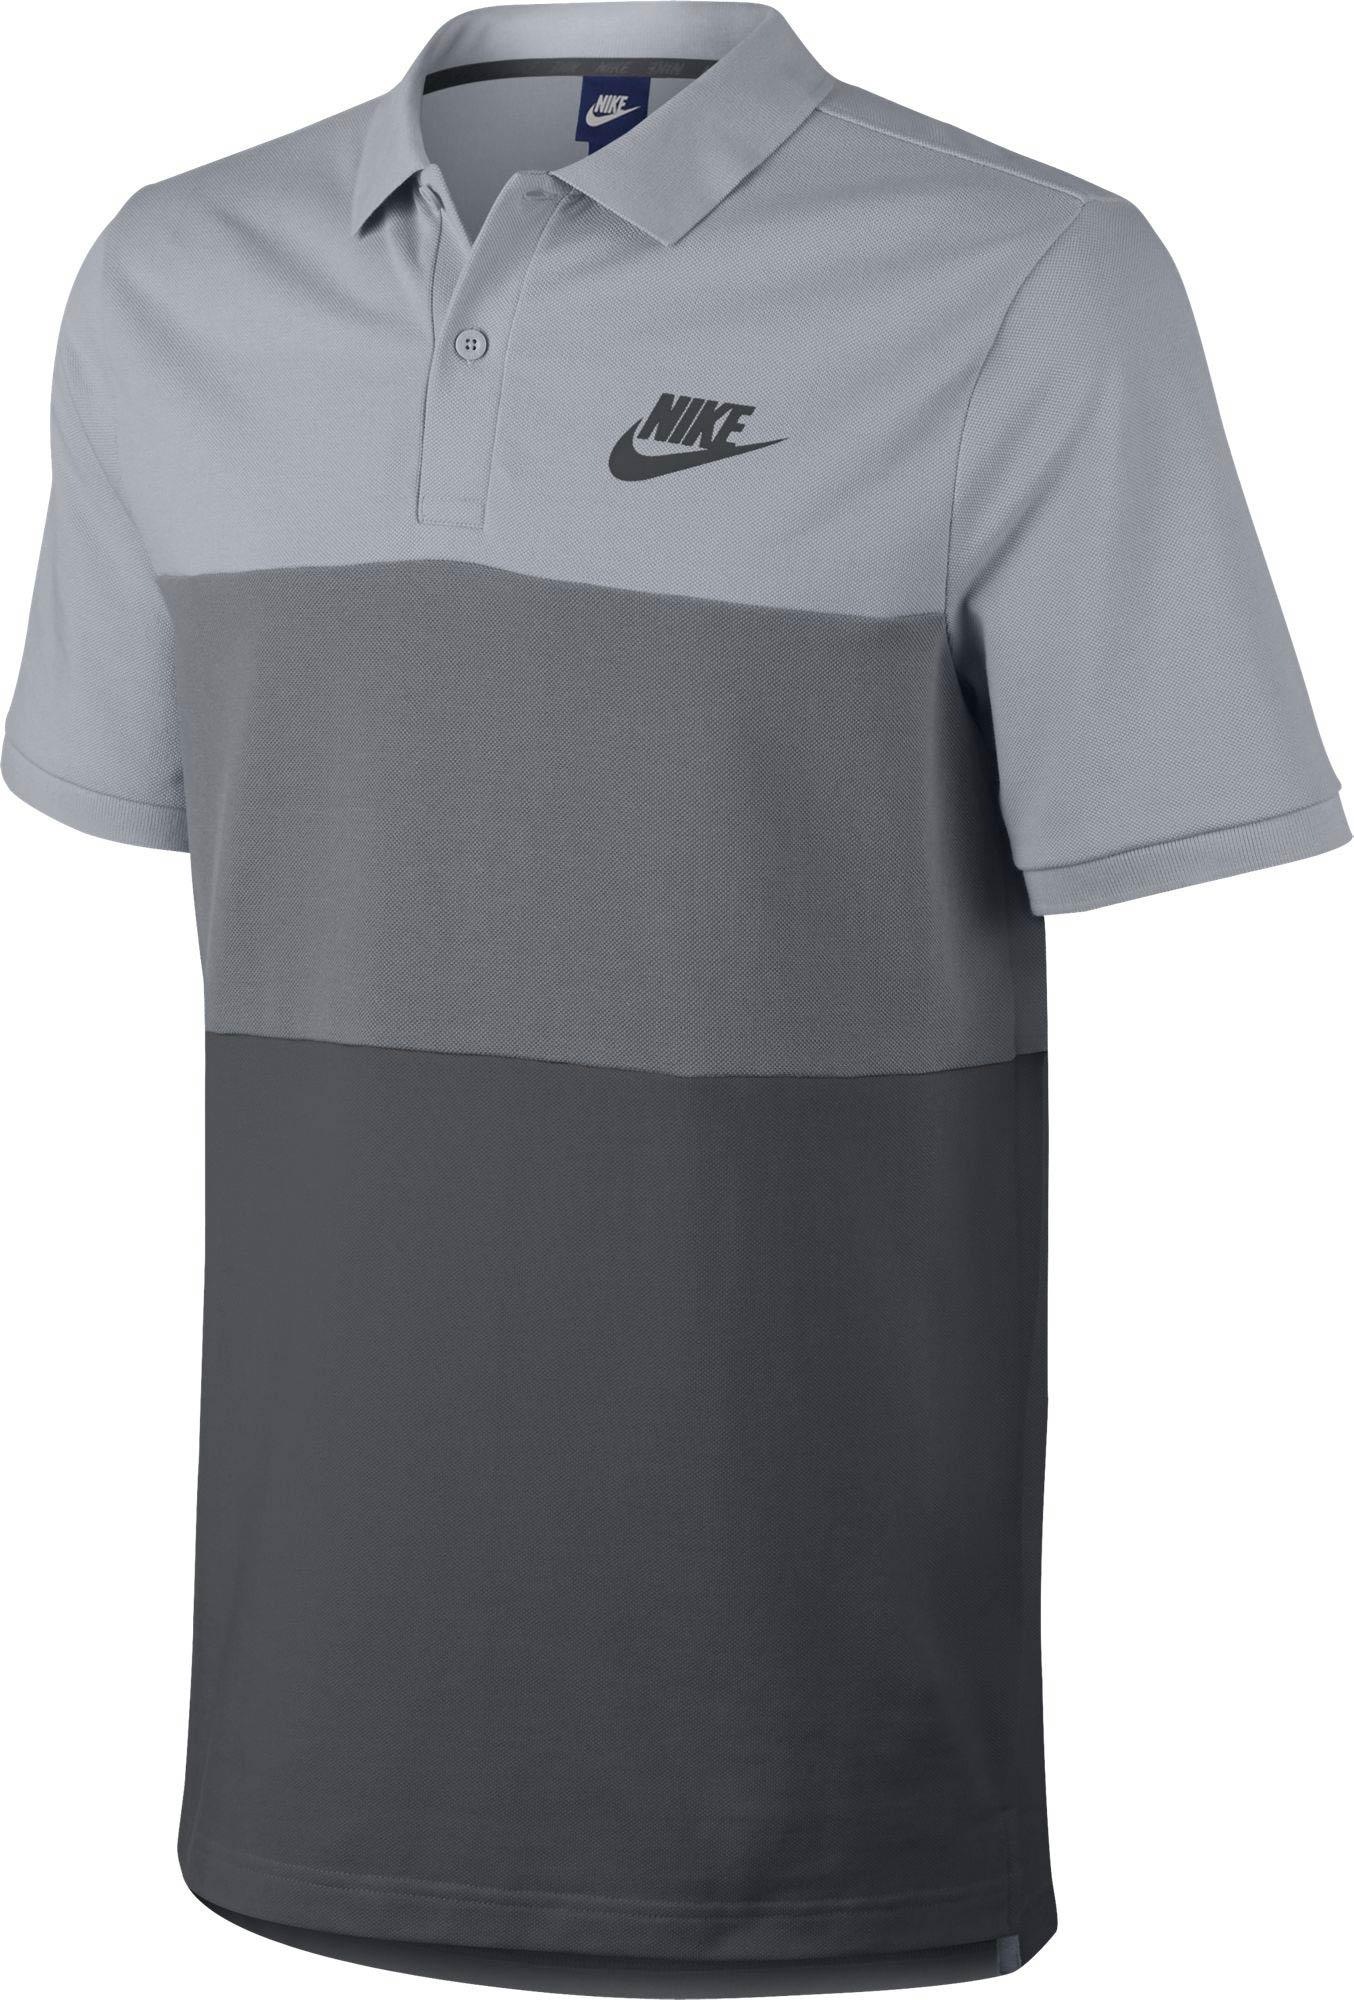 45c532350a795 Nike M NSW POLO PQ MATCHUP. Men s polo shirt